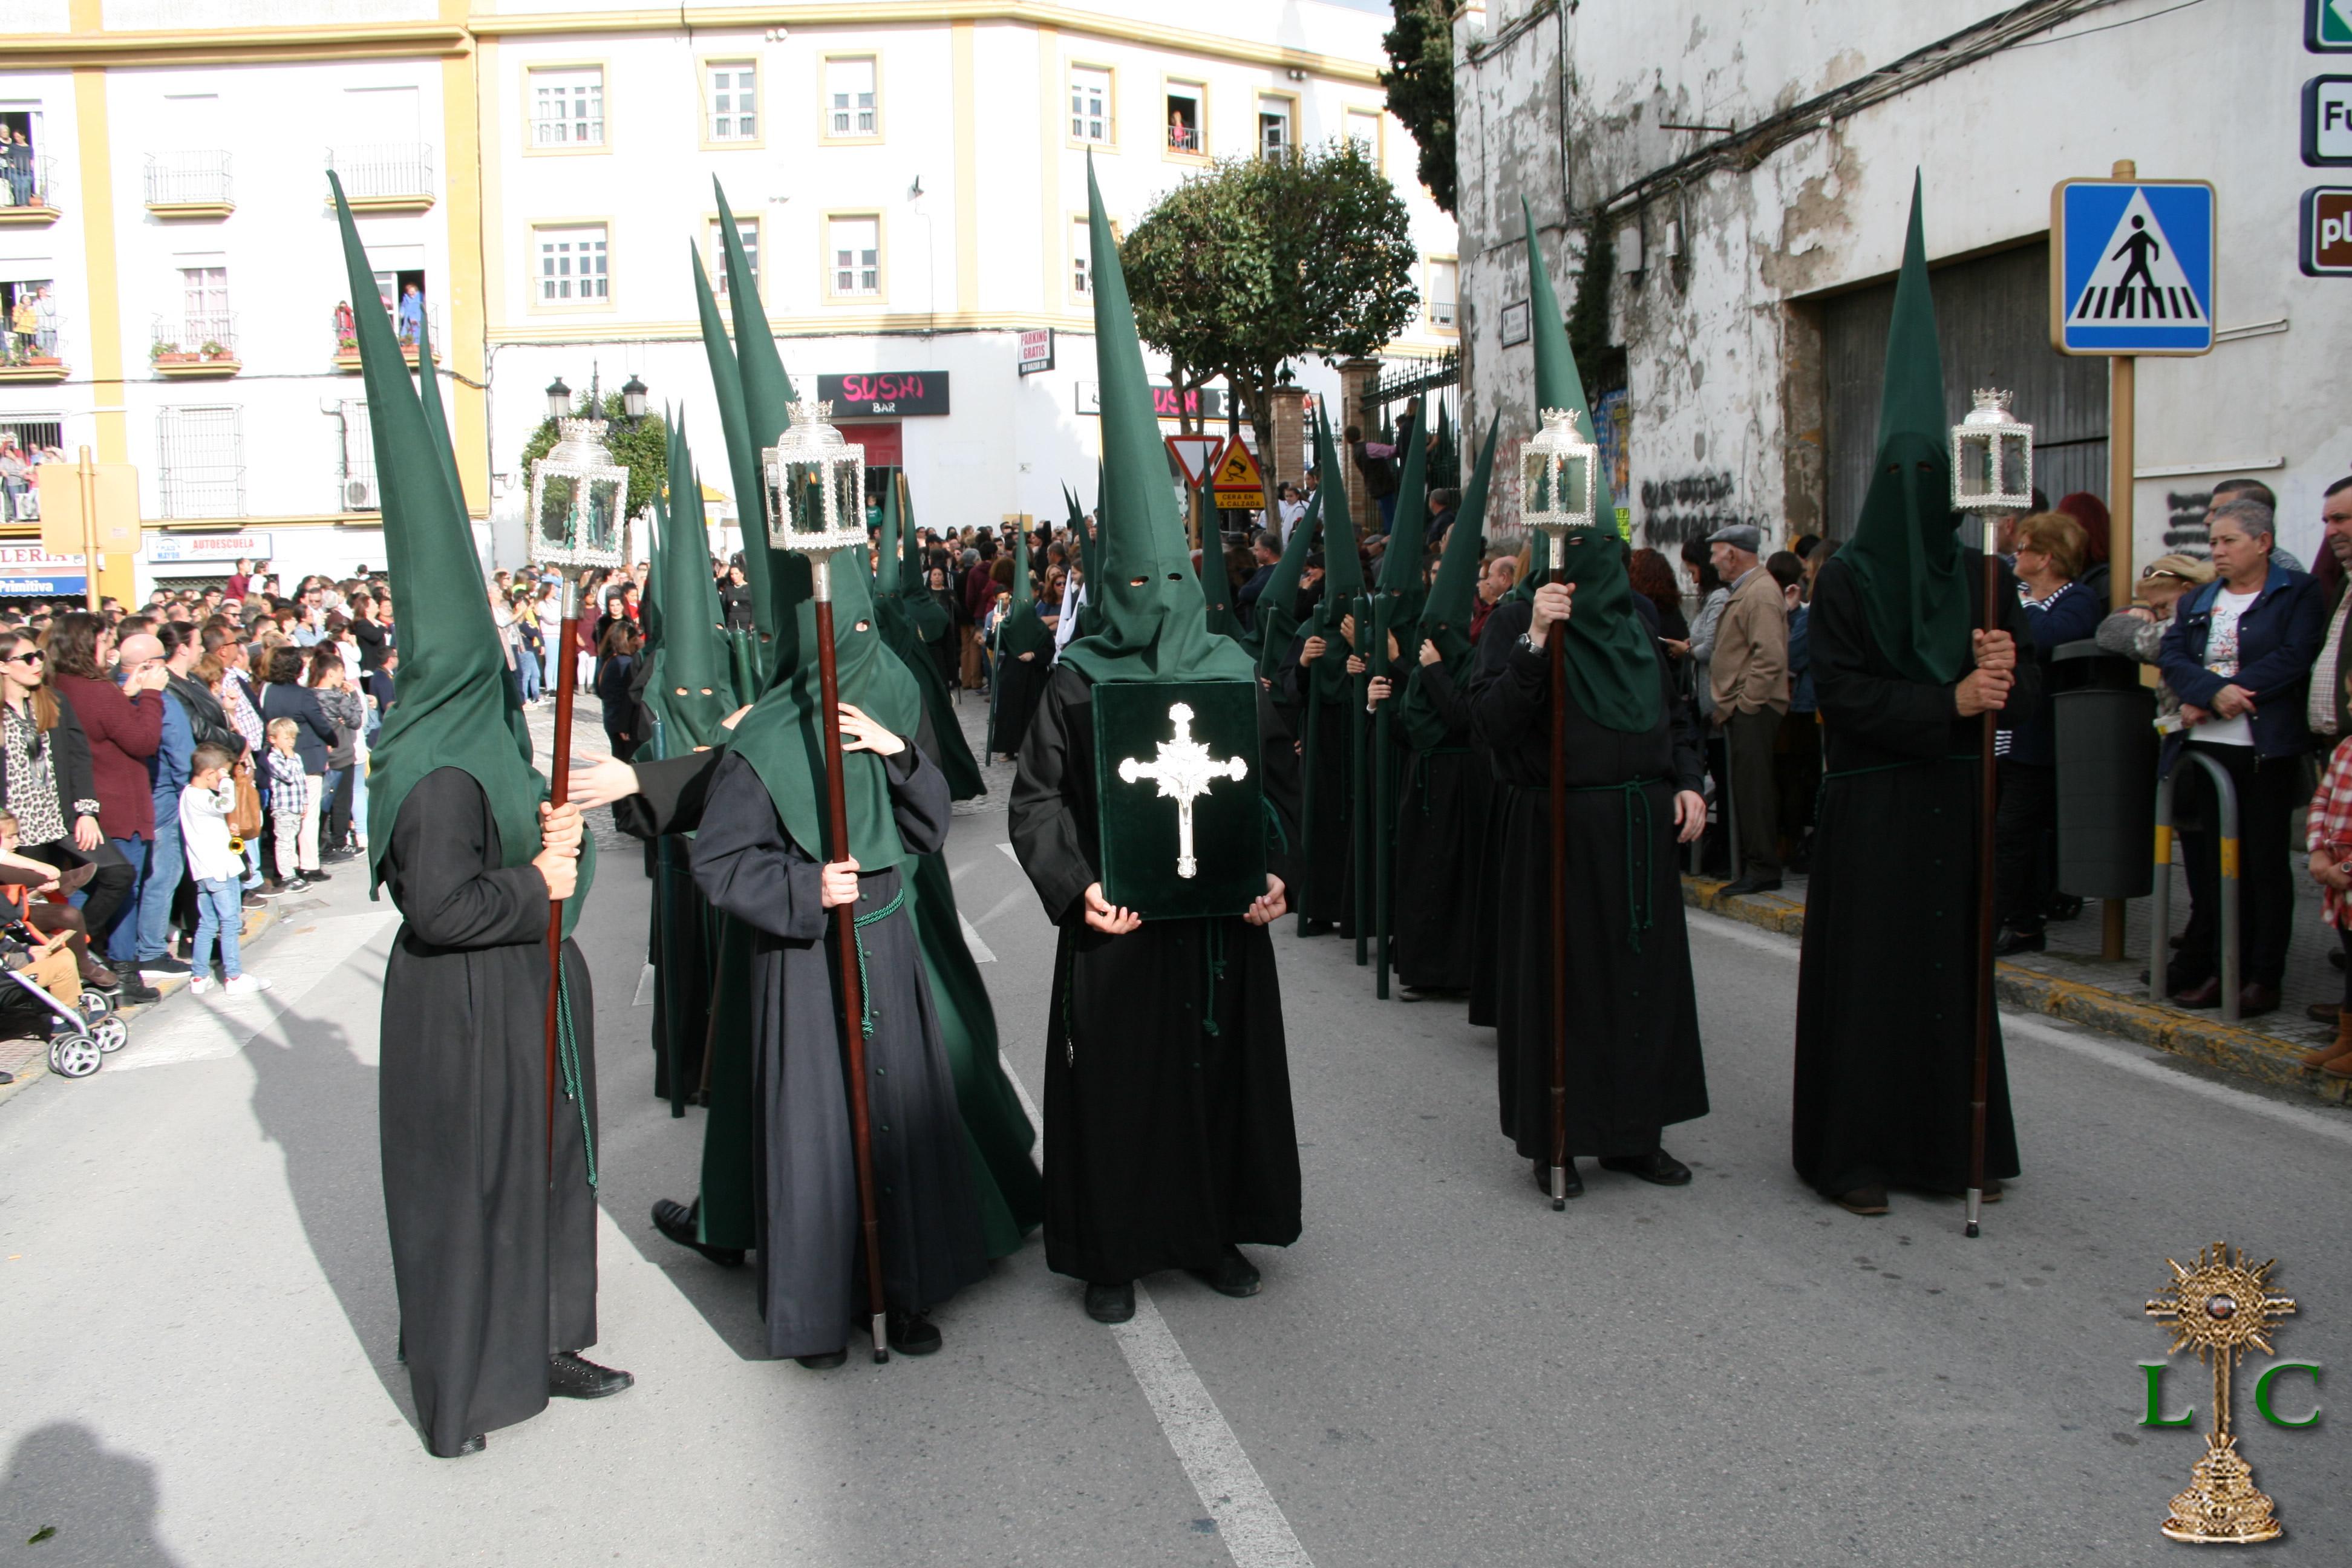 www.lignumcrucis.es-vera-cruz-chiclana-estacion-2019-10